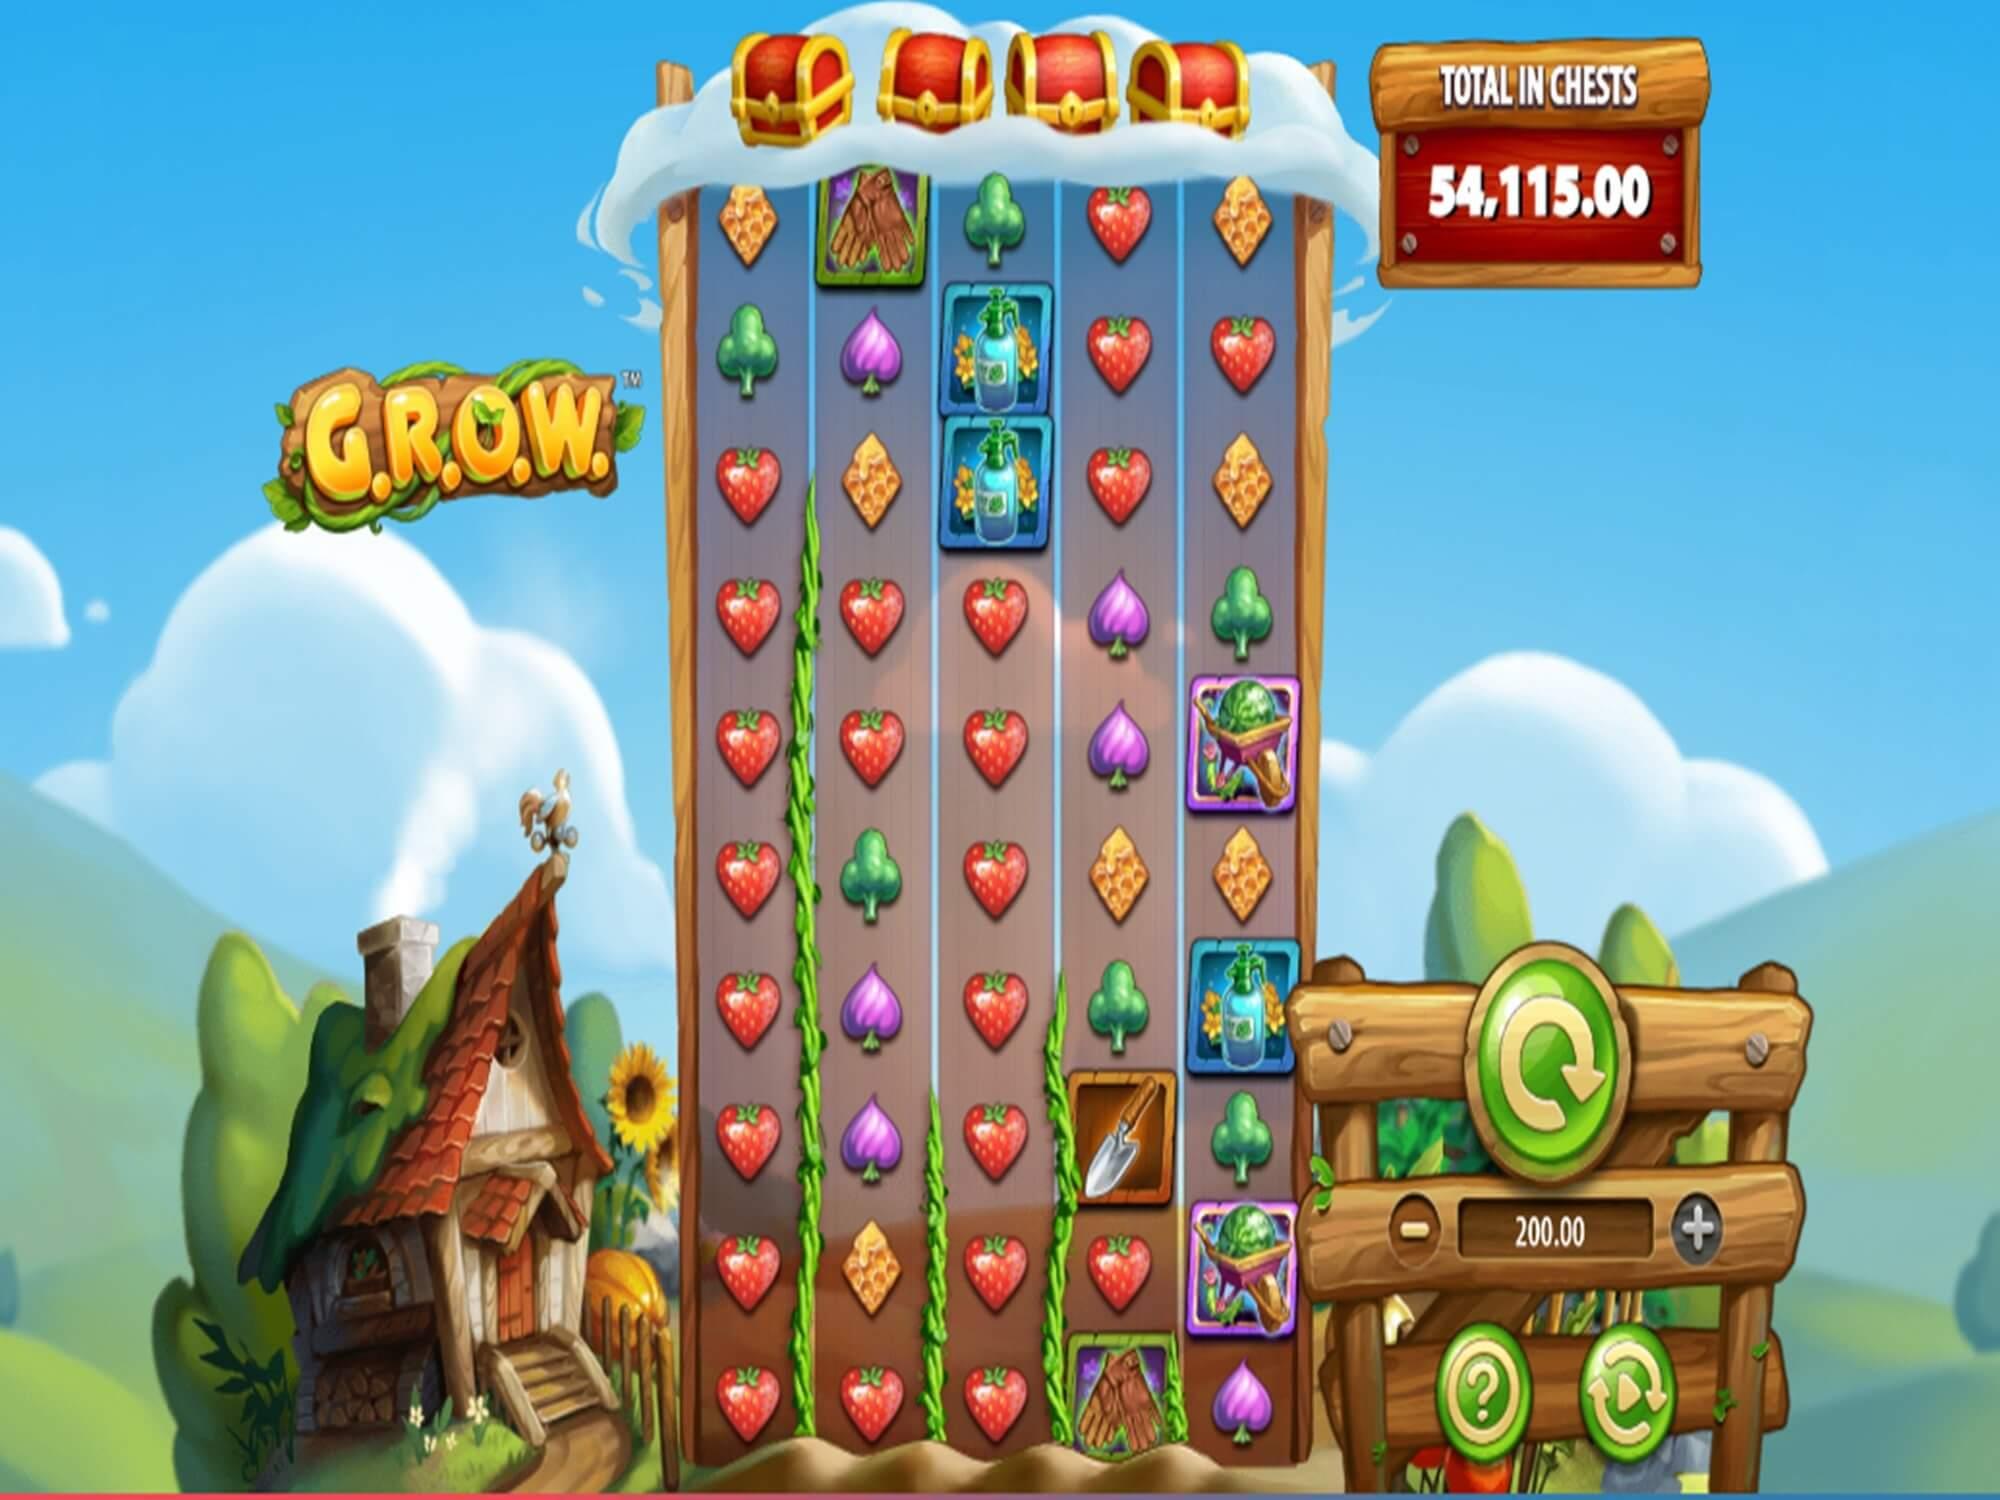 GROW Slot Bonus